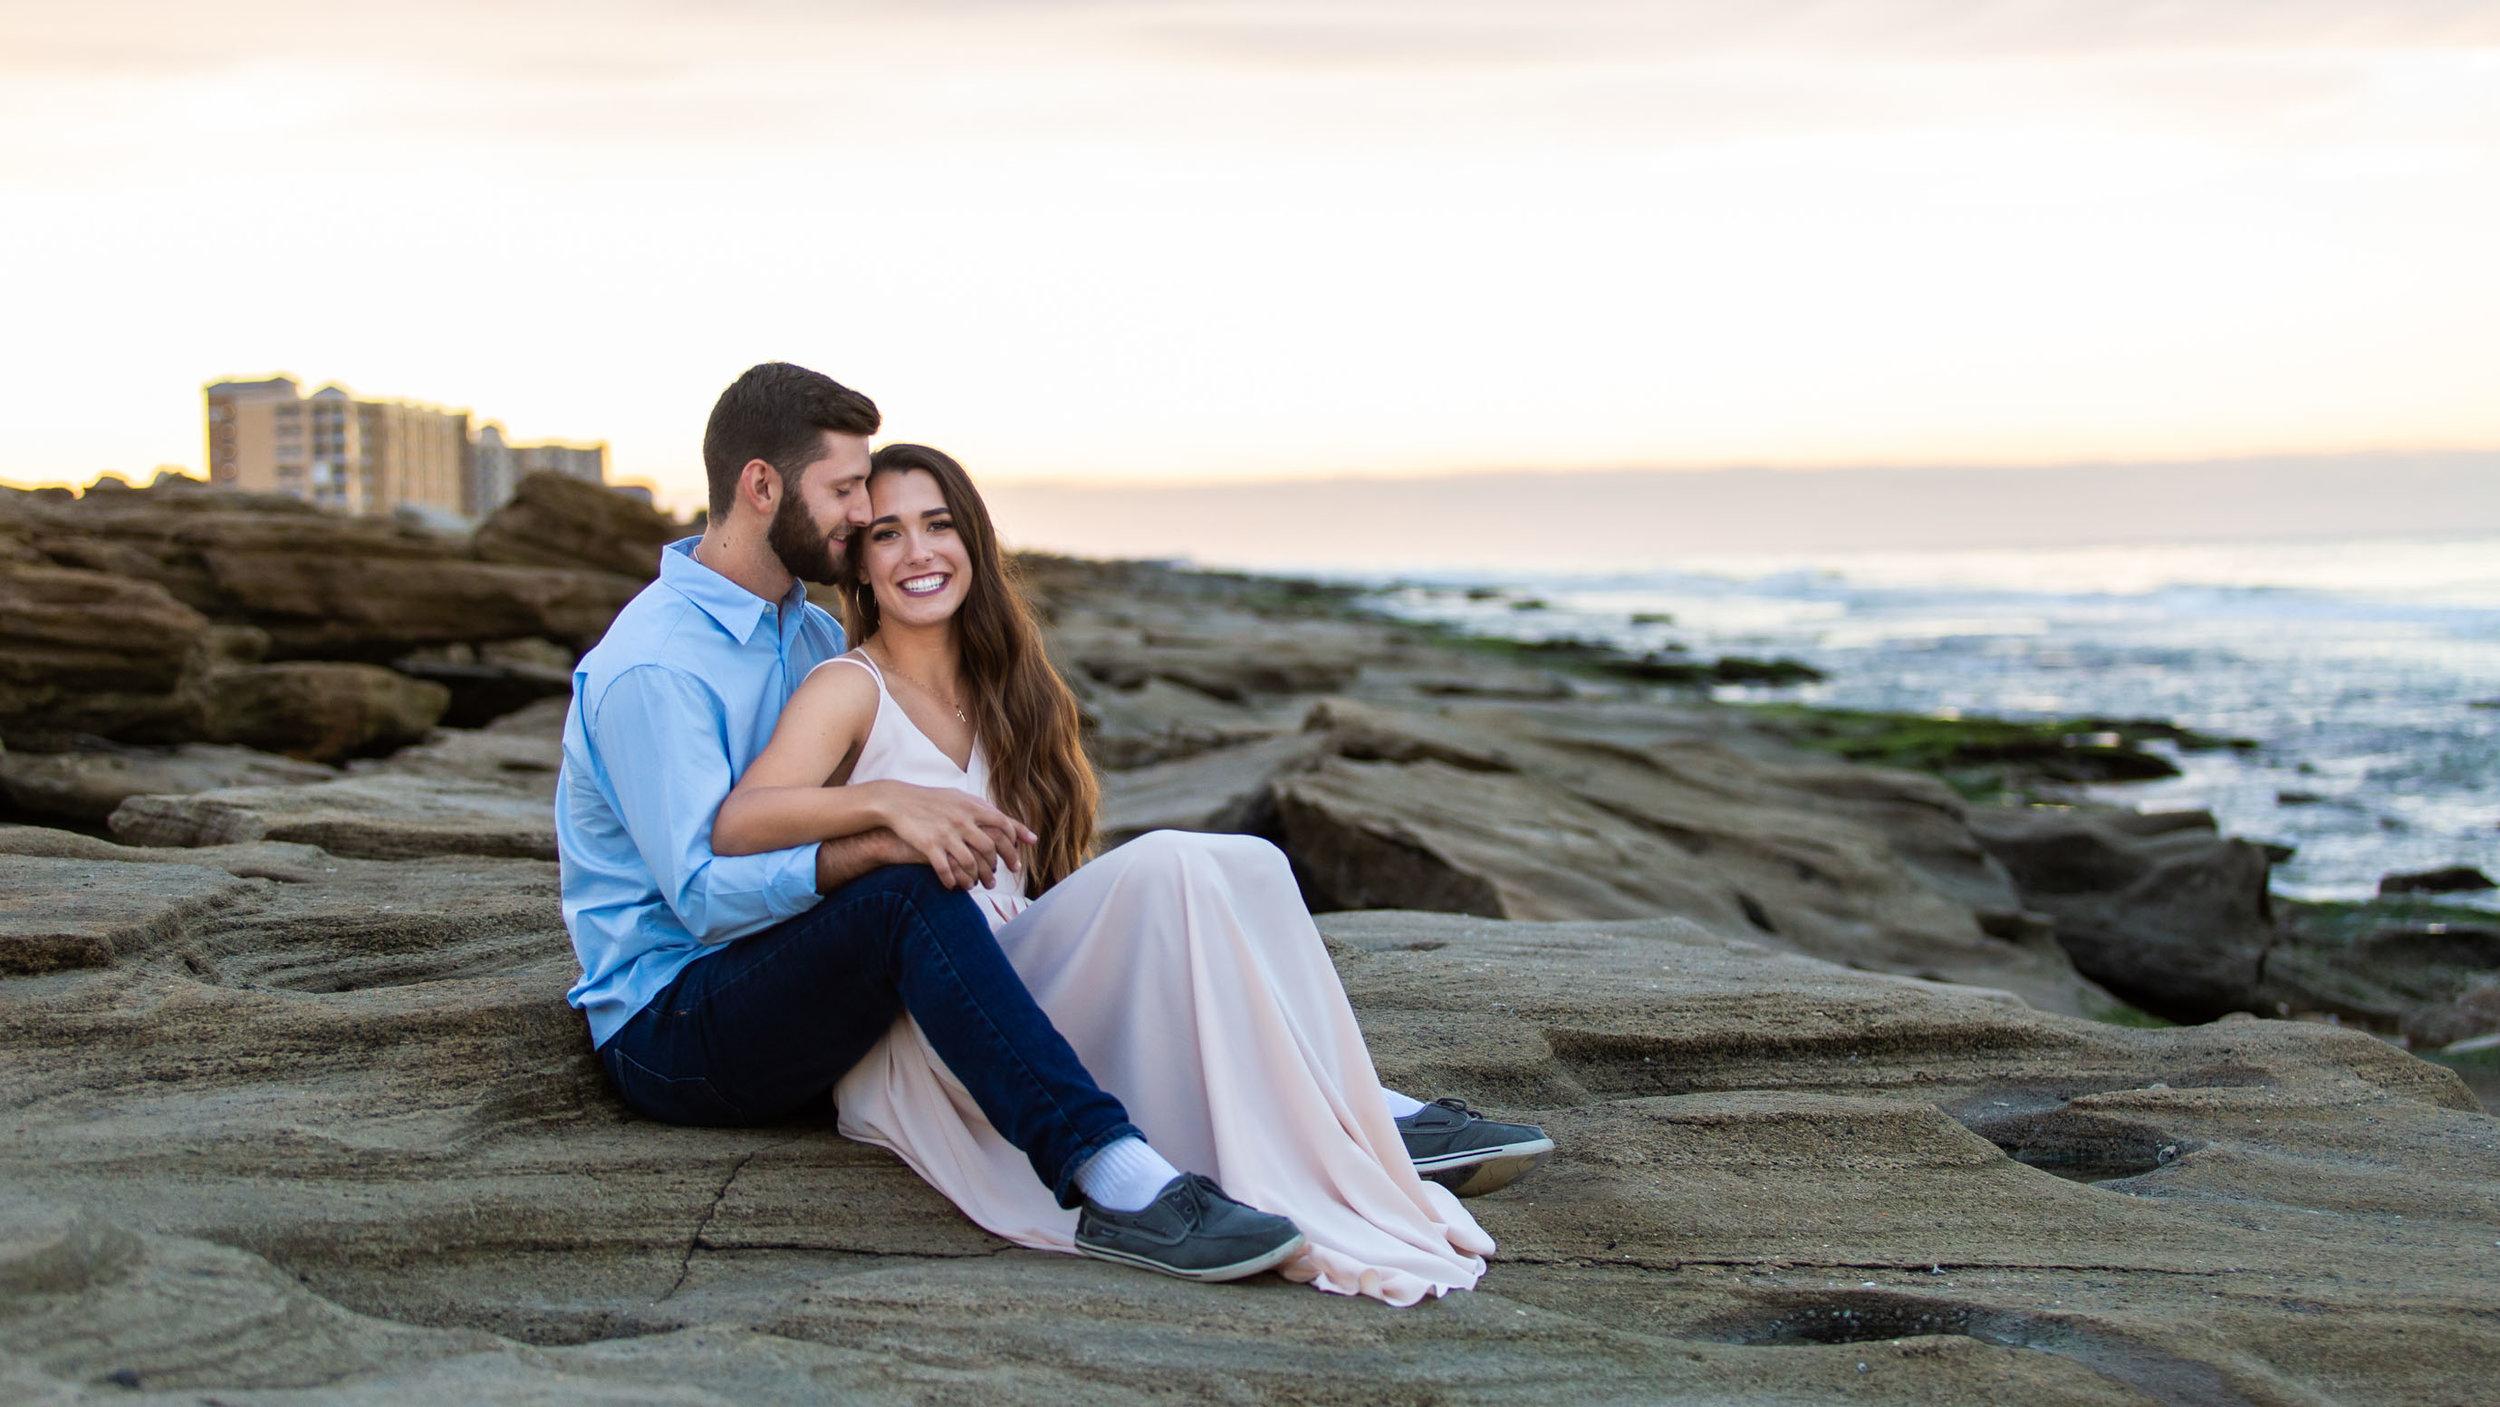 adam-szarmack-jacksonville-wedding-photographer-palm-coast-washing-oaks-garden-state-park-engagement-51.jpg